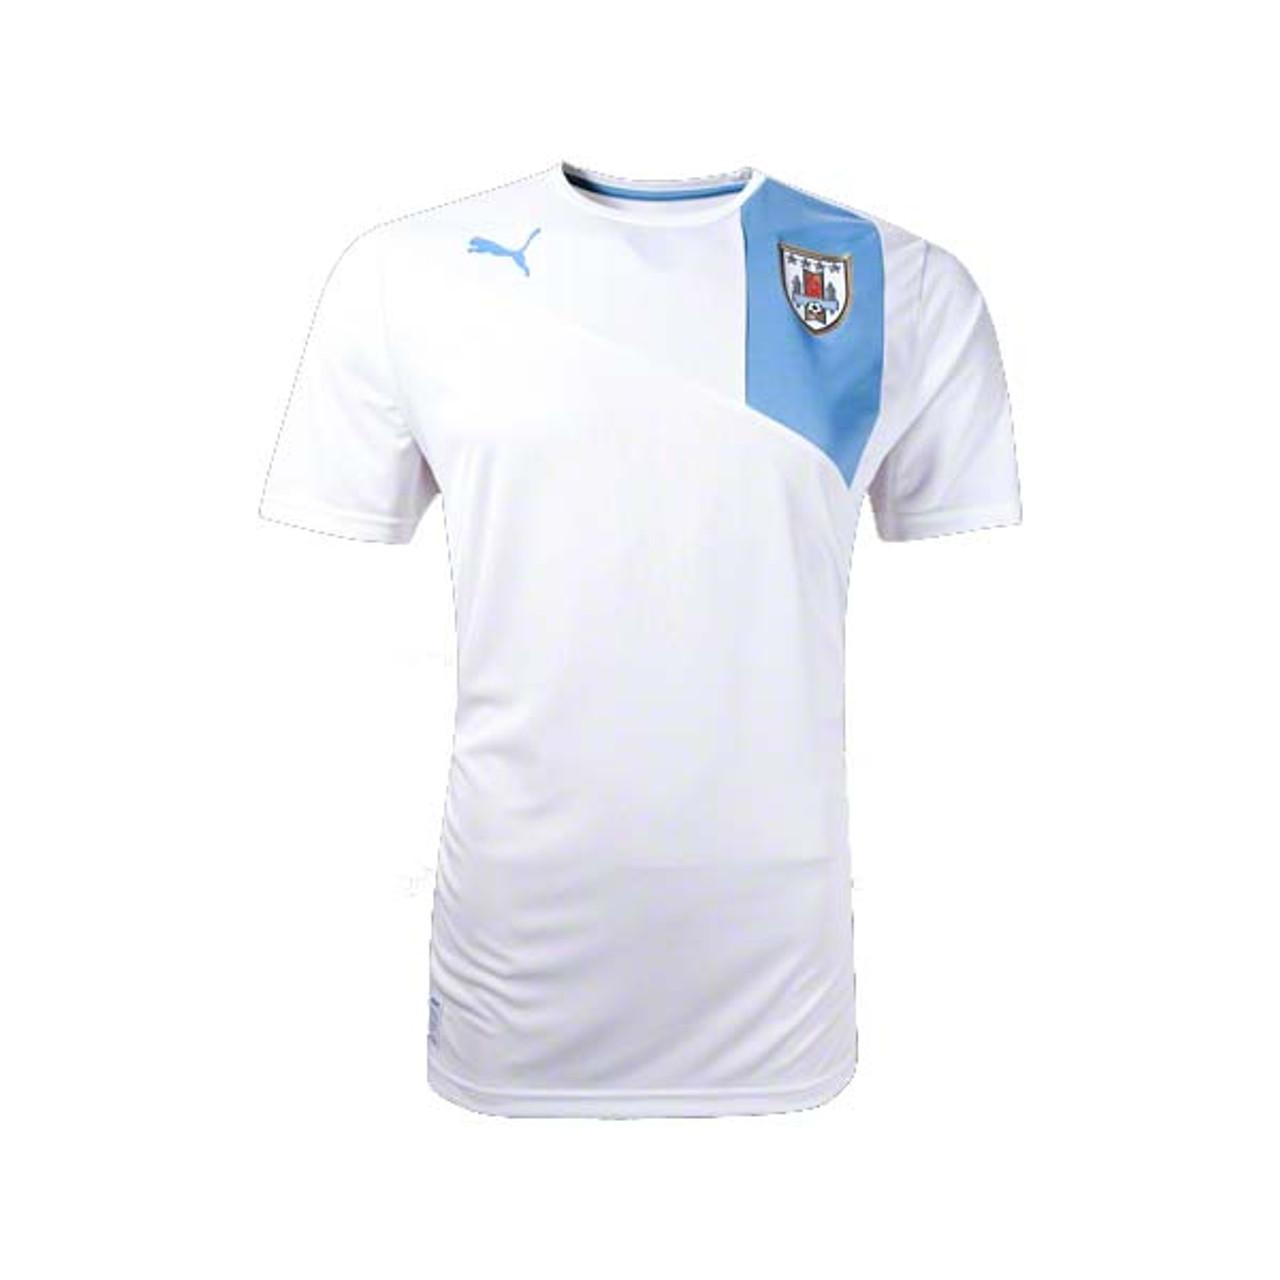 2bc02567b PUMA URUGUAY 2013 AWAY JERSEY WHITE - Soccer Plus